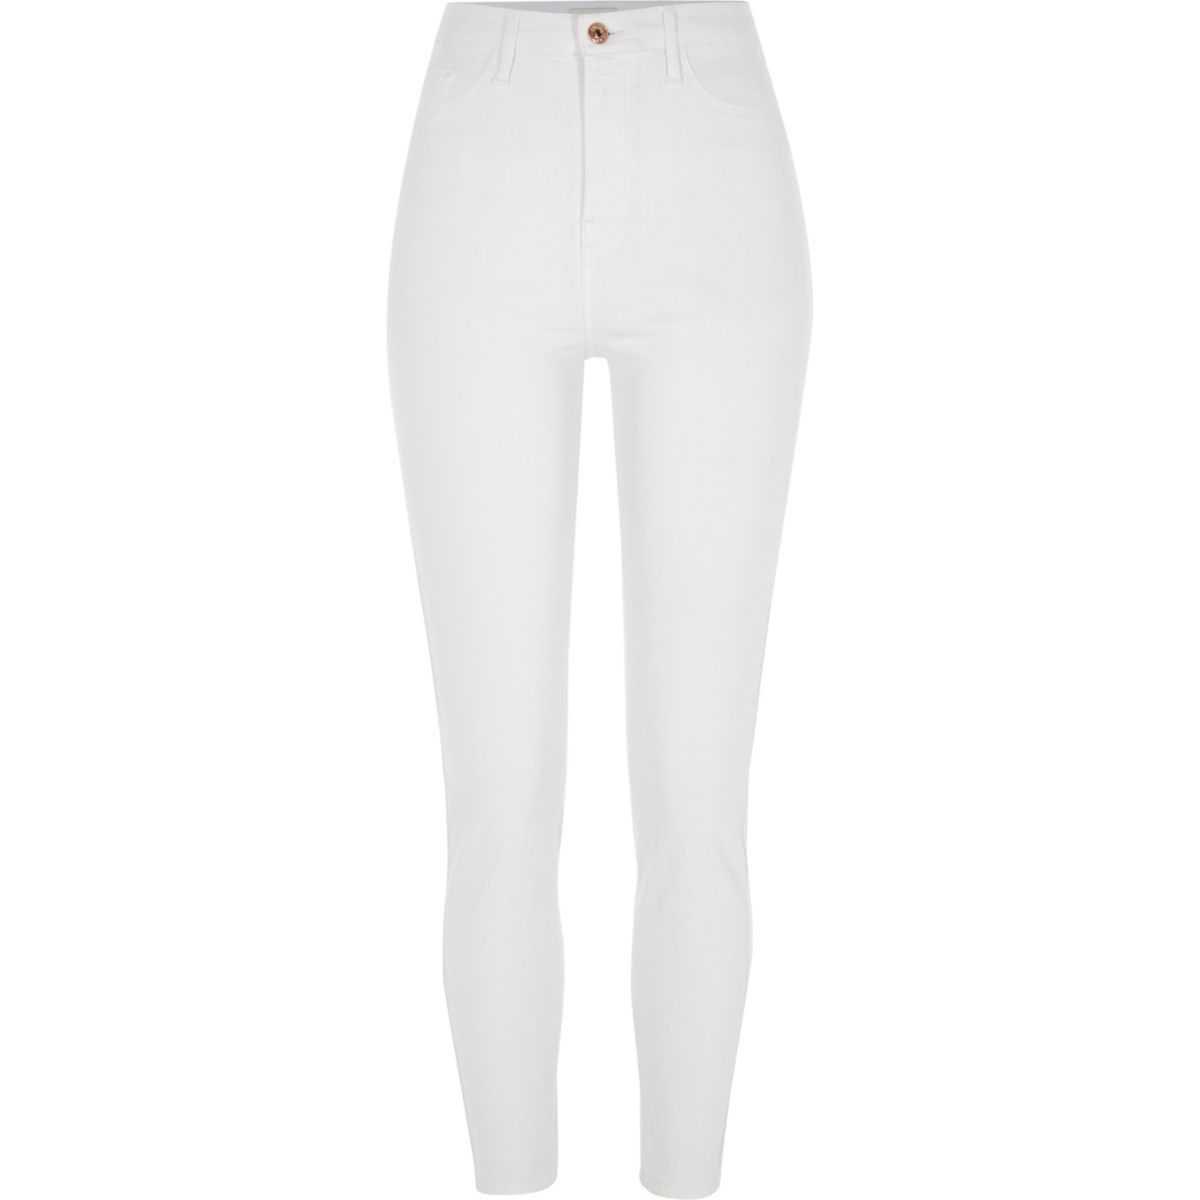 White Harper high waisted super skinny jeans - Skinny Jeans - Jeans - women